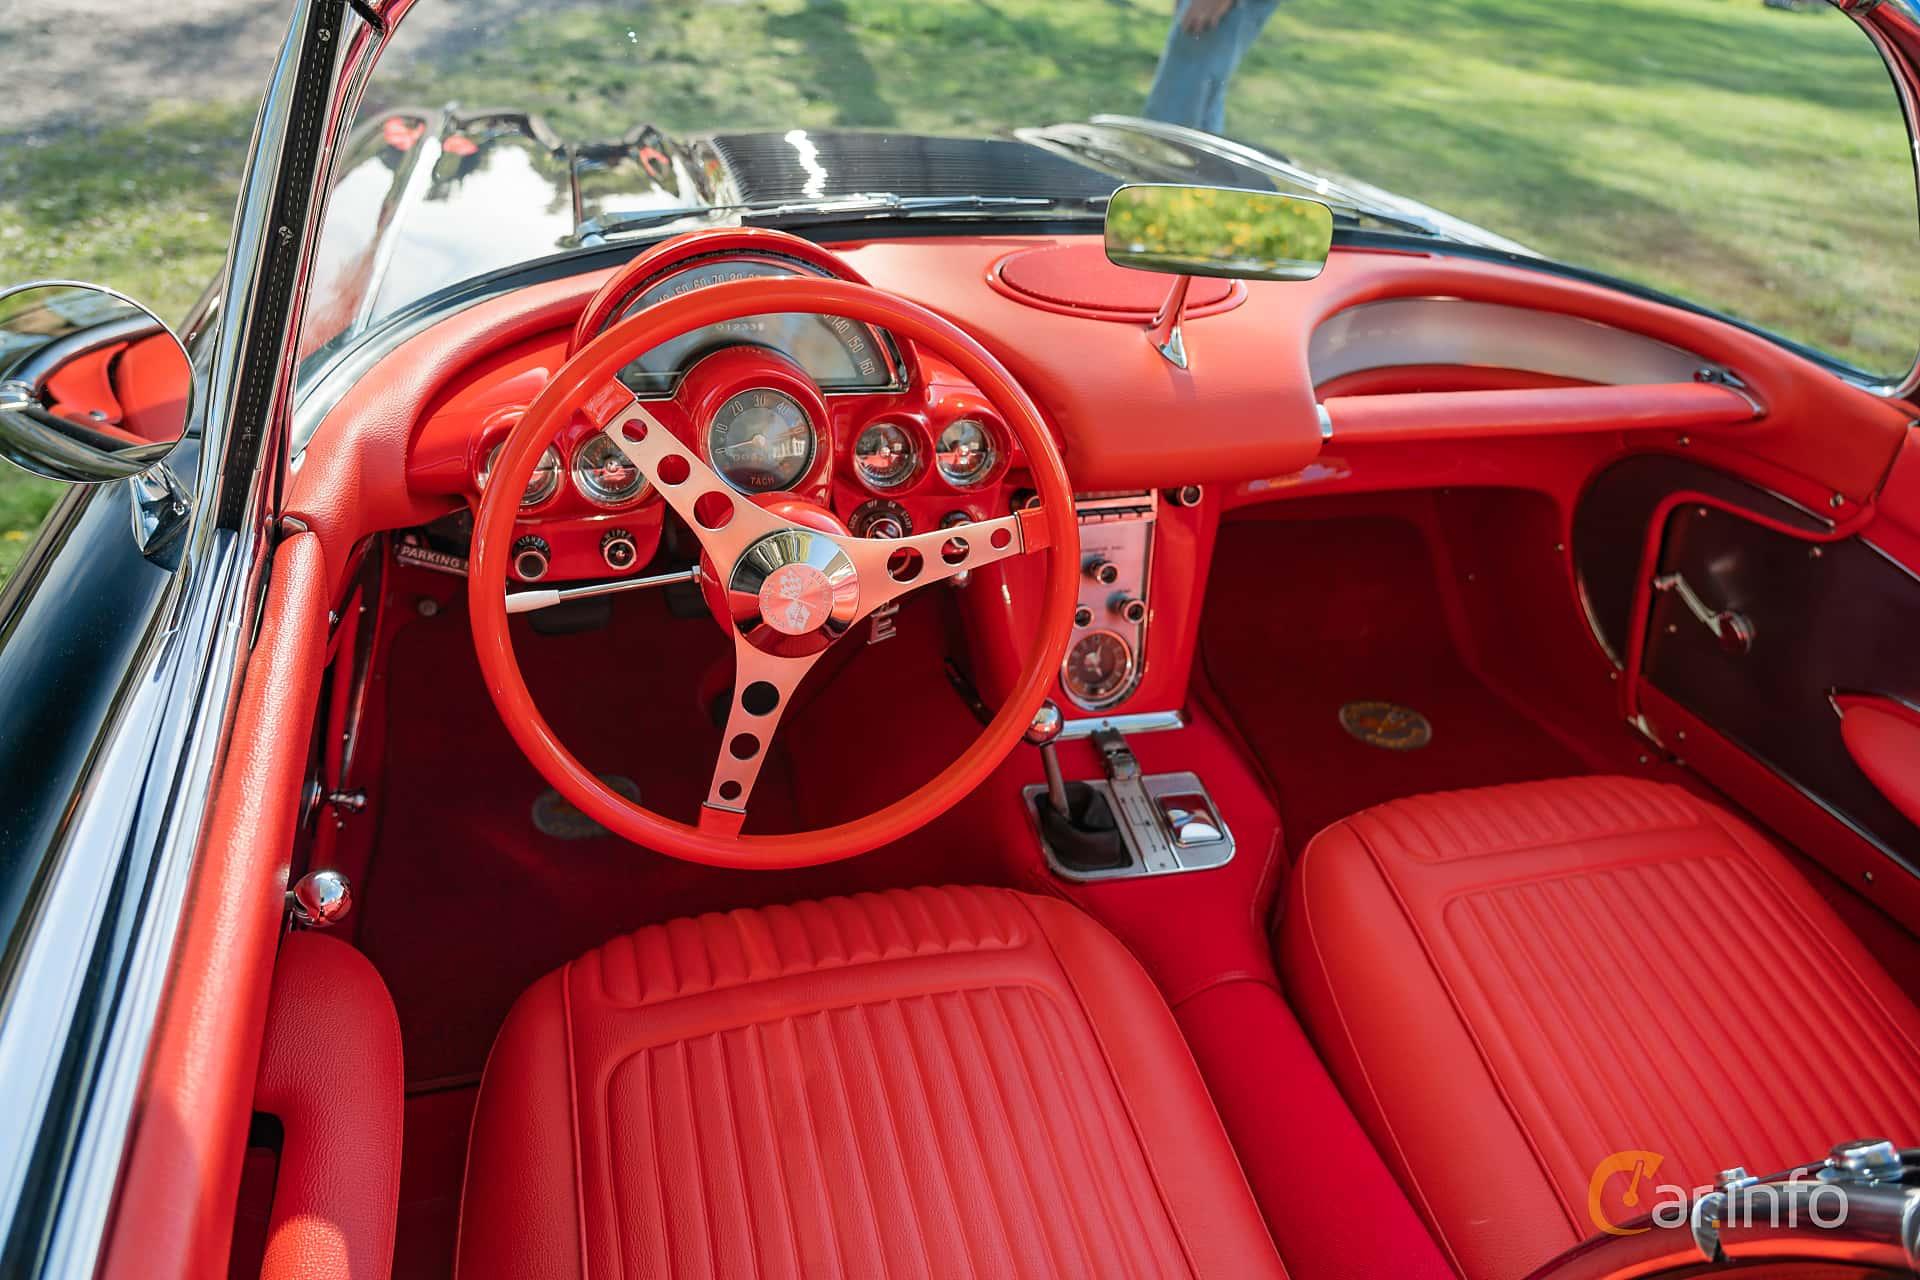 Chevrolet Corvette 4.6 V8 Manual, 270hp, 1958 at Lissma Classic Car 2019 vecka 20